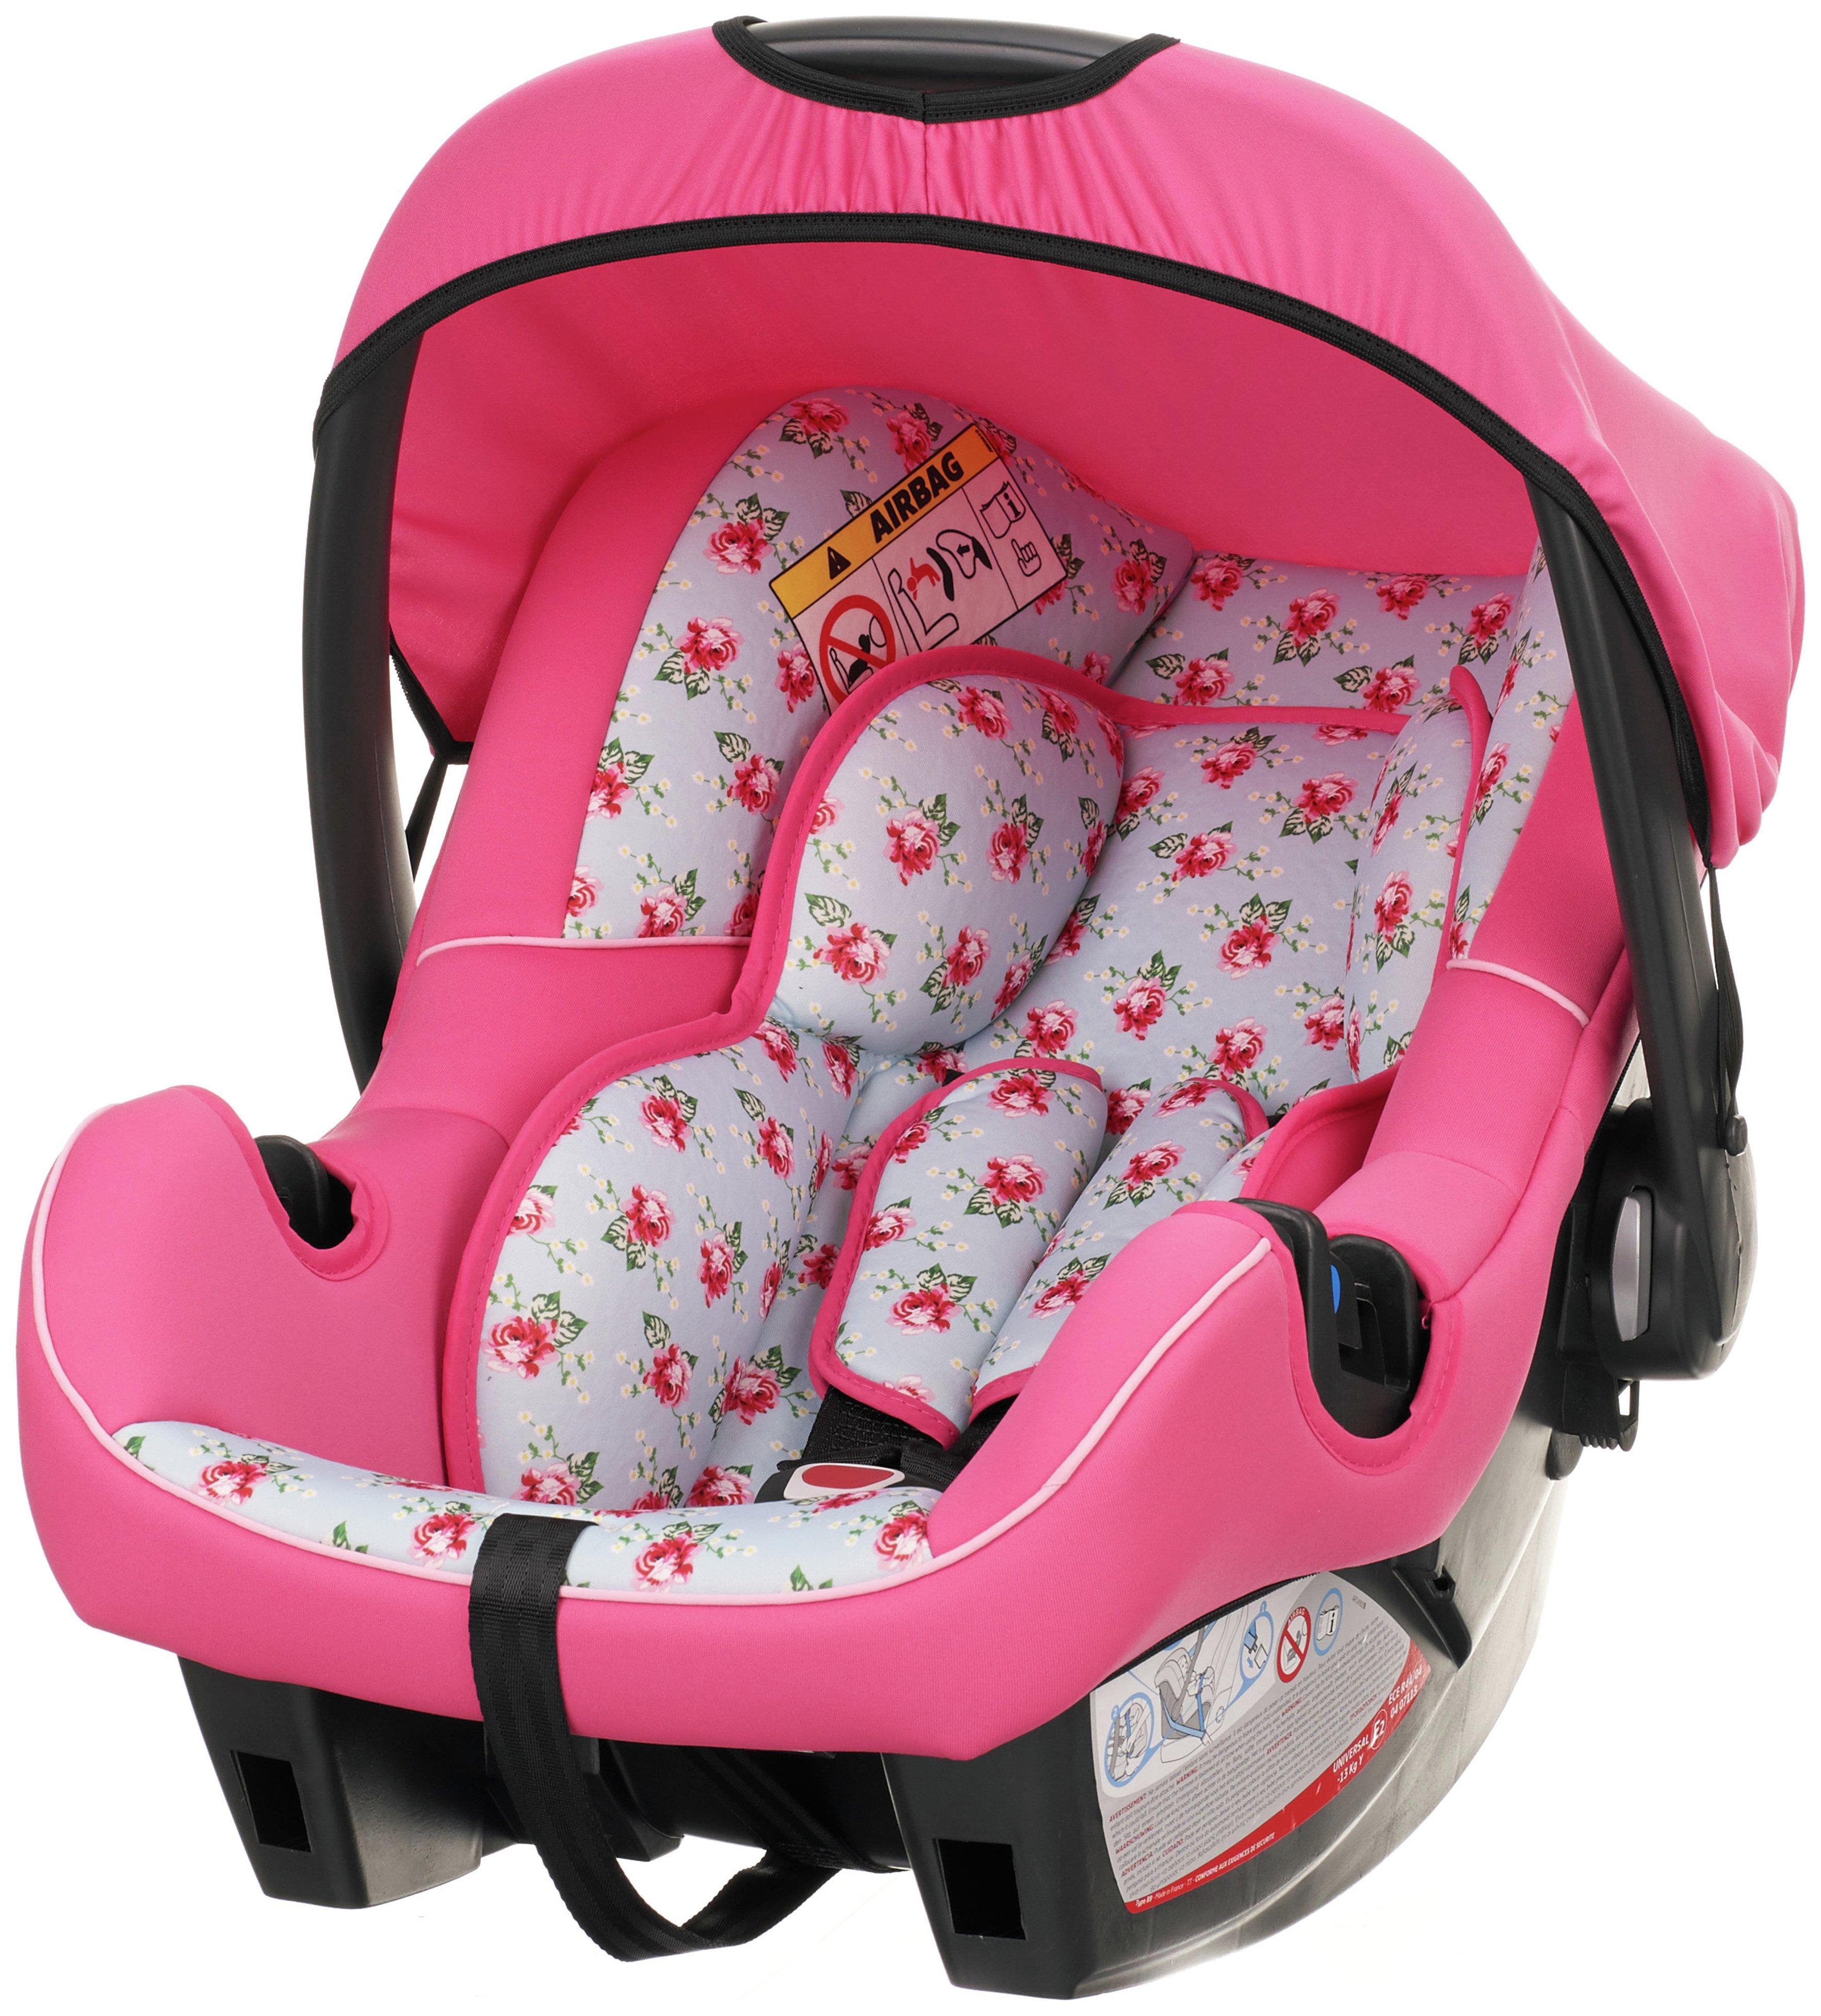 obaby-hera-group-0-infant-car-seat-cottage-rose